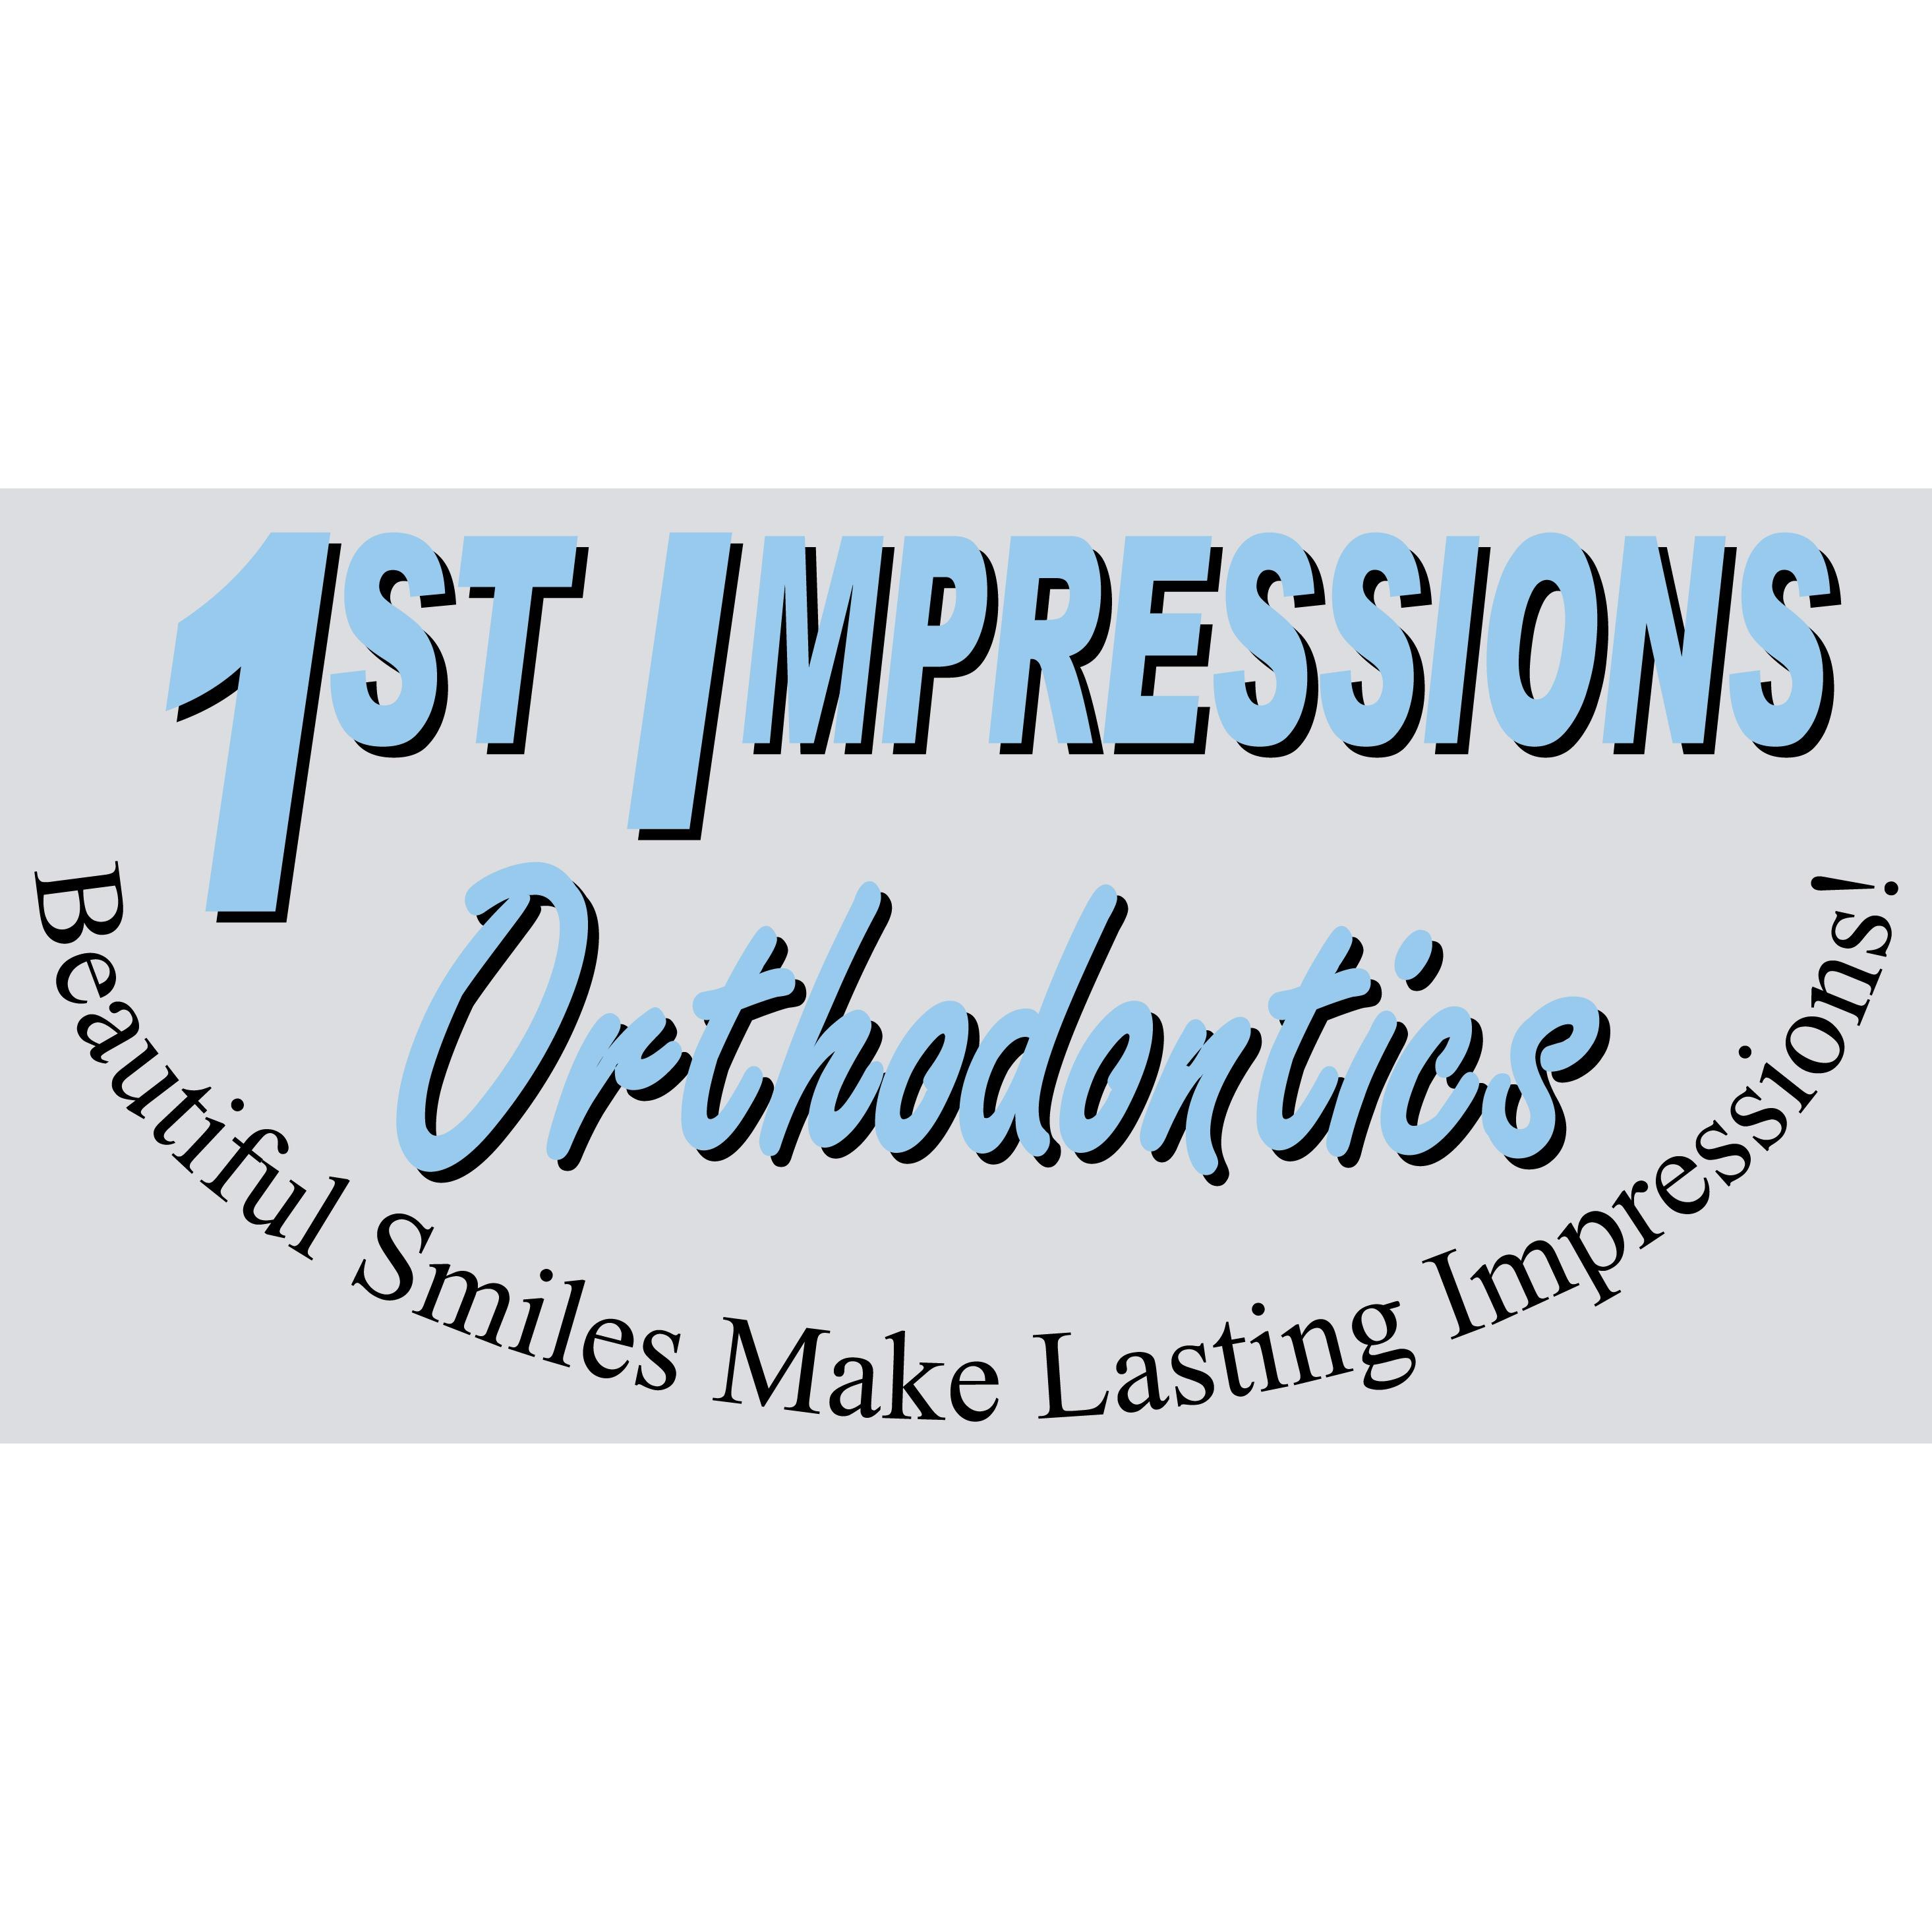 1ST IMPRESSIONS Orthodontics